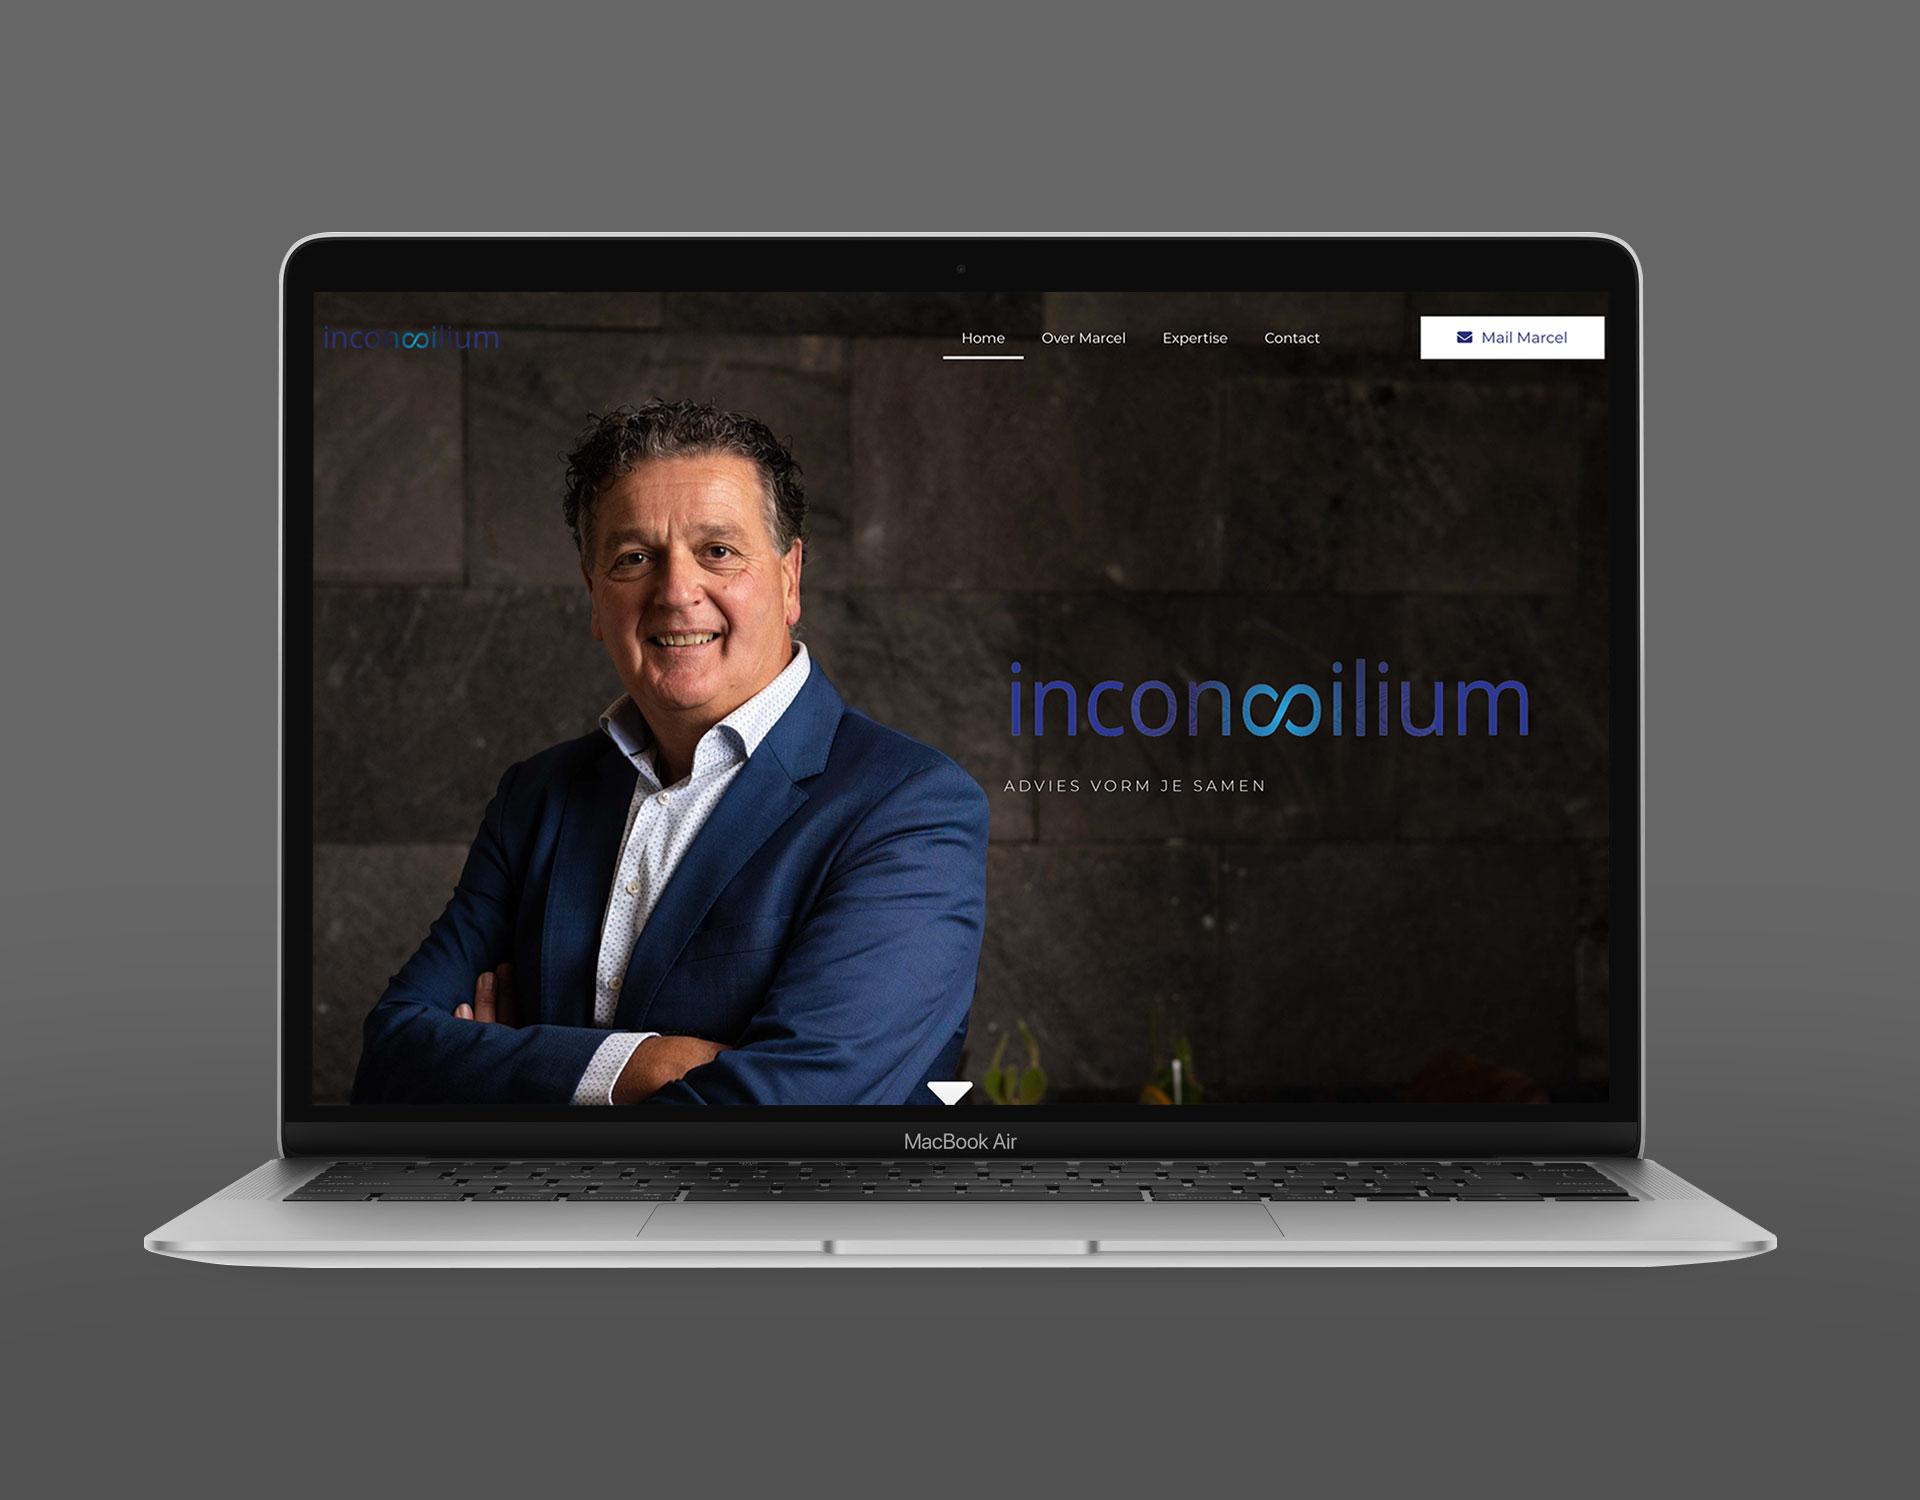 Inconsilium-Marcel-Nijhoff-Mockup